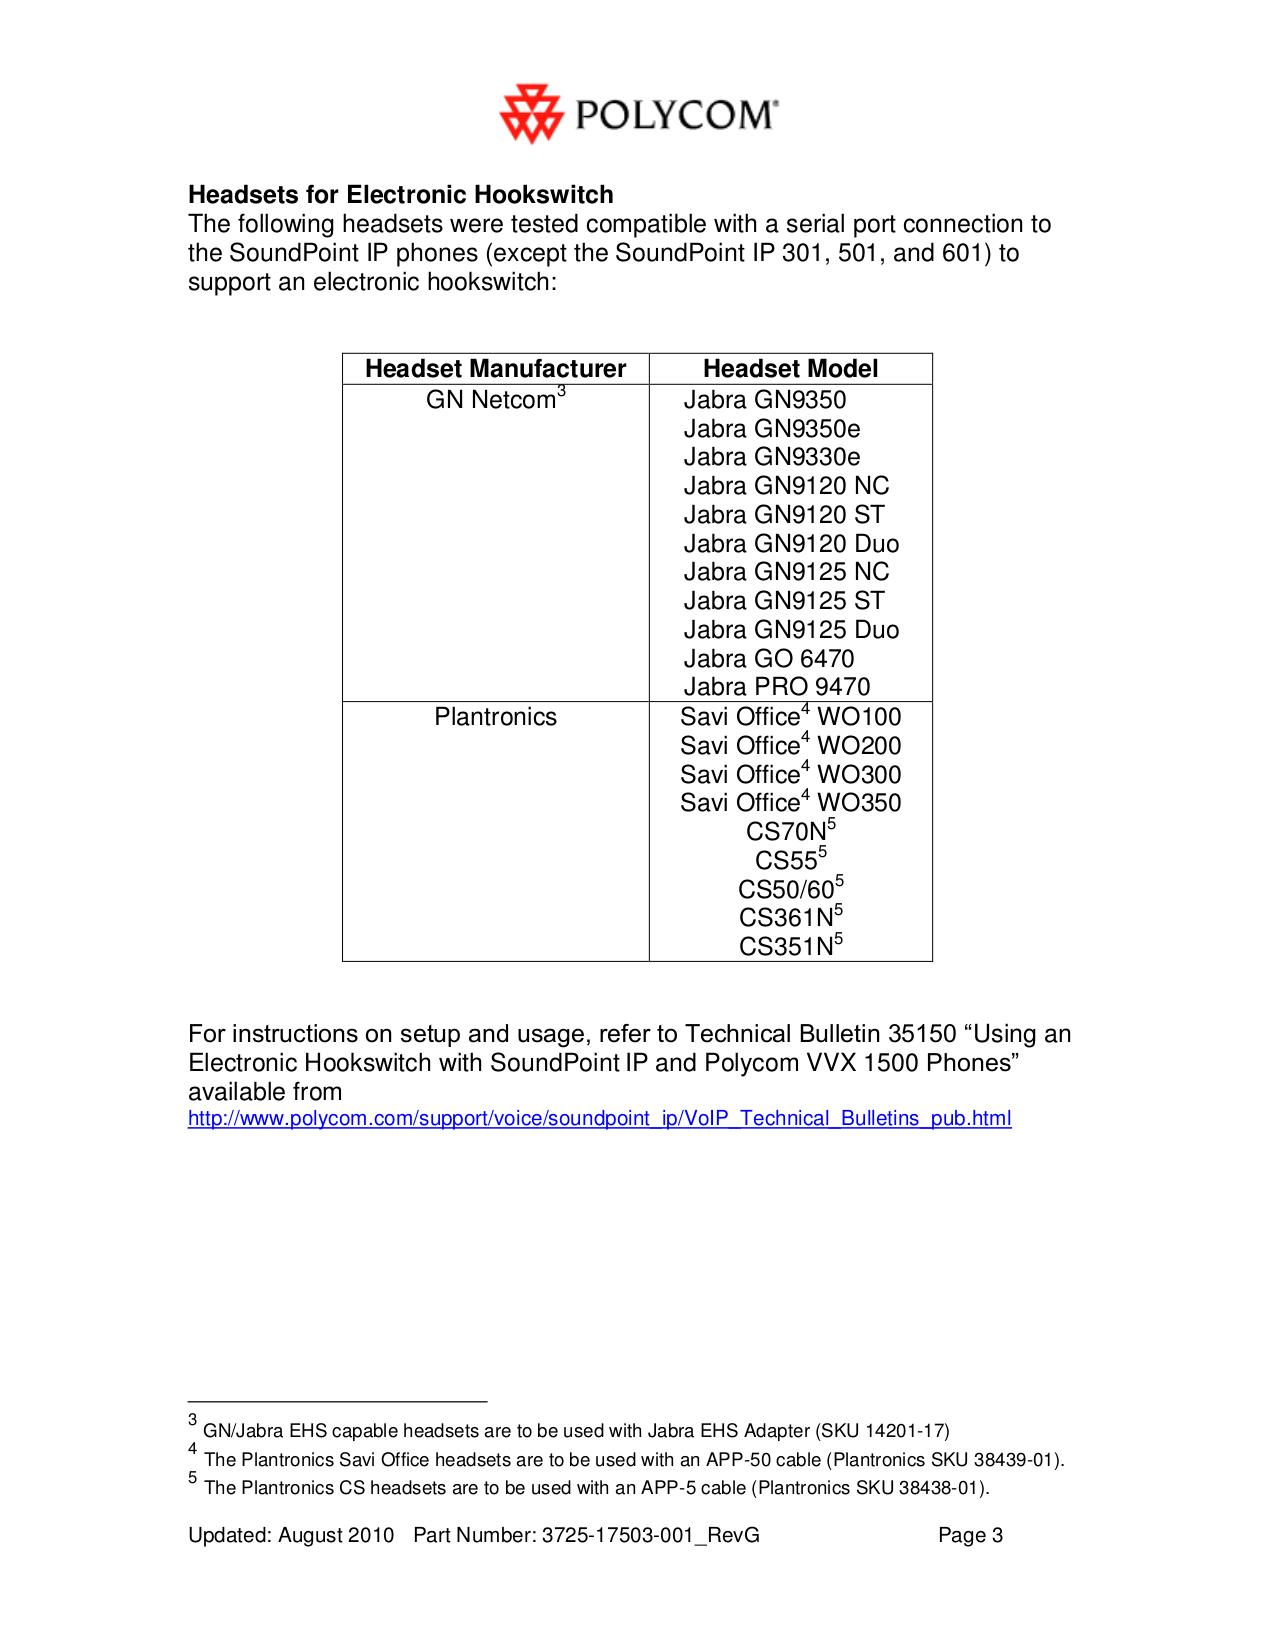 PDF manual for Plantronics Headset CS50